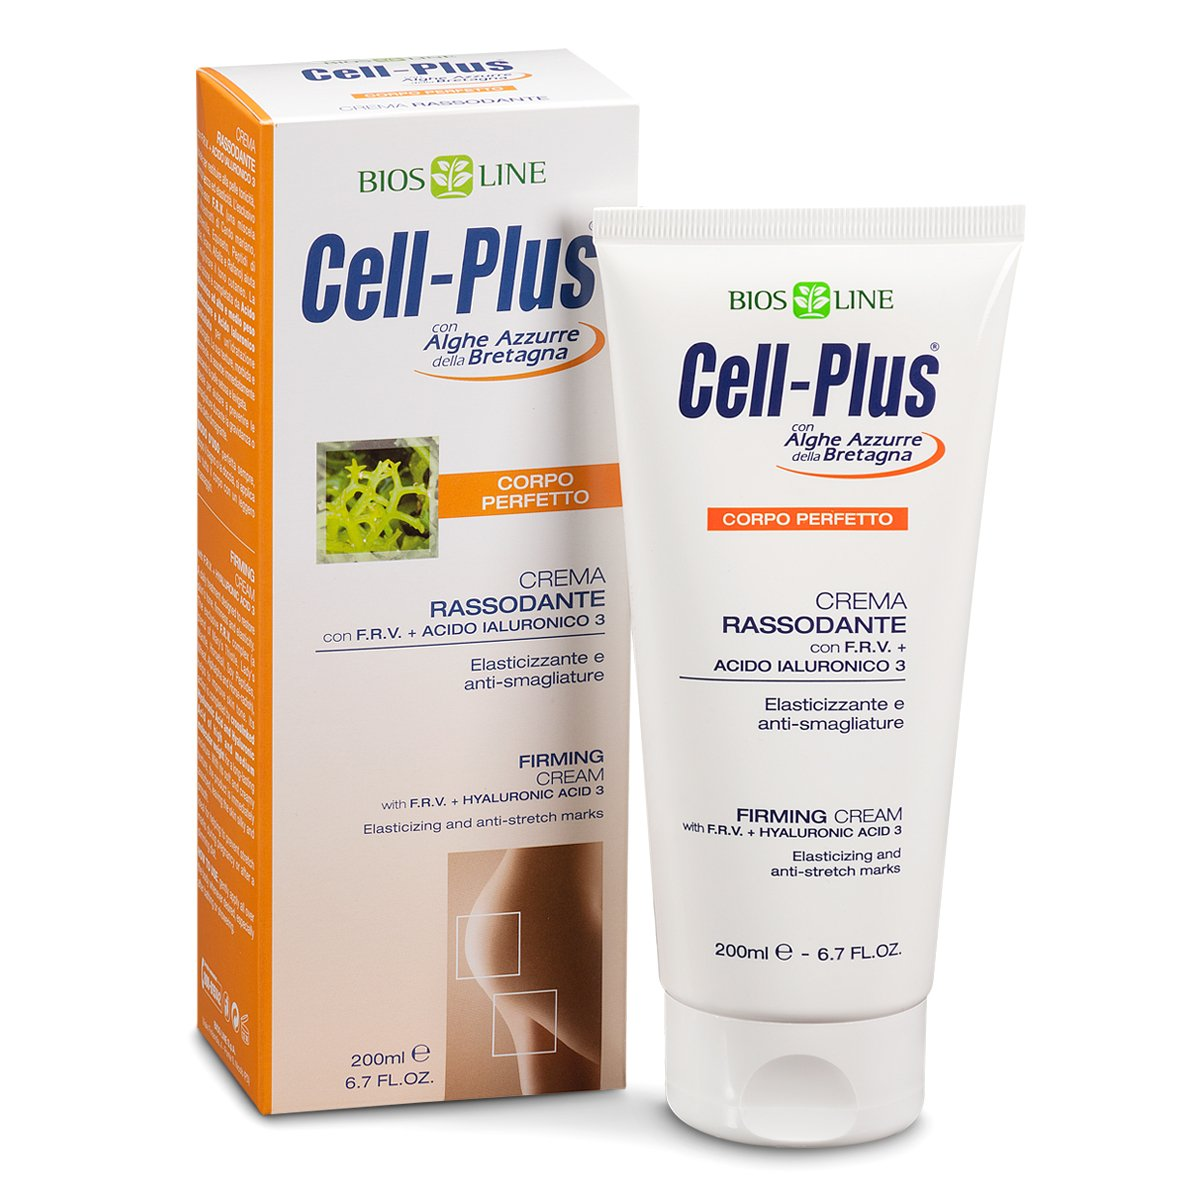 CELL-PLUS CREMA RASSODANTE 200ML